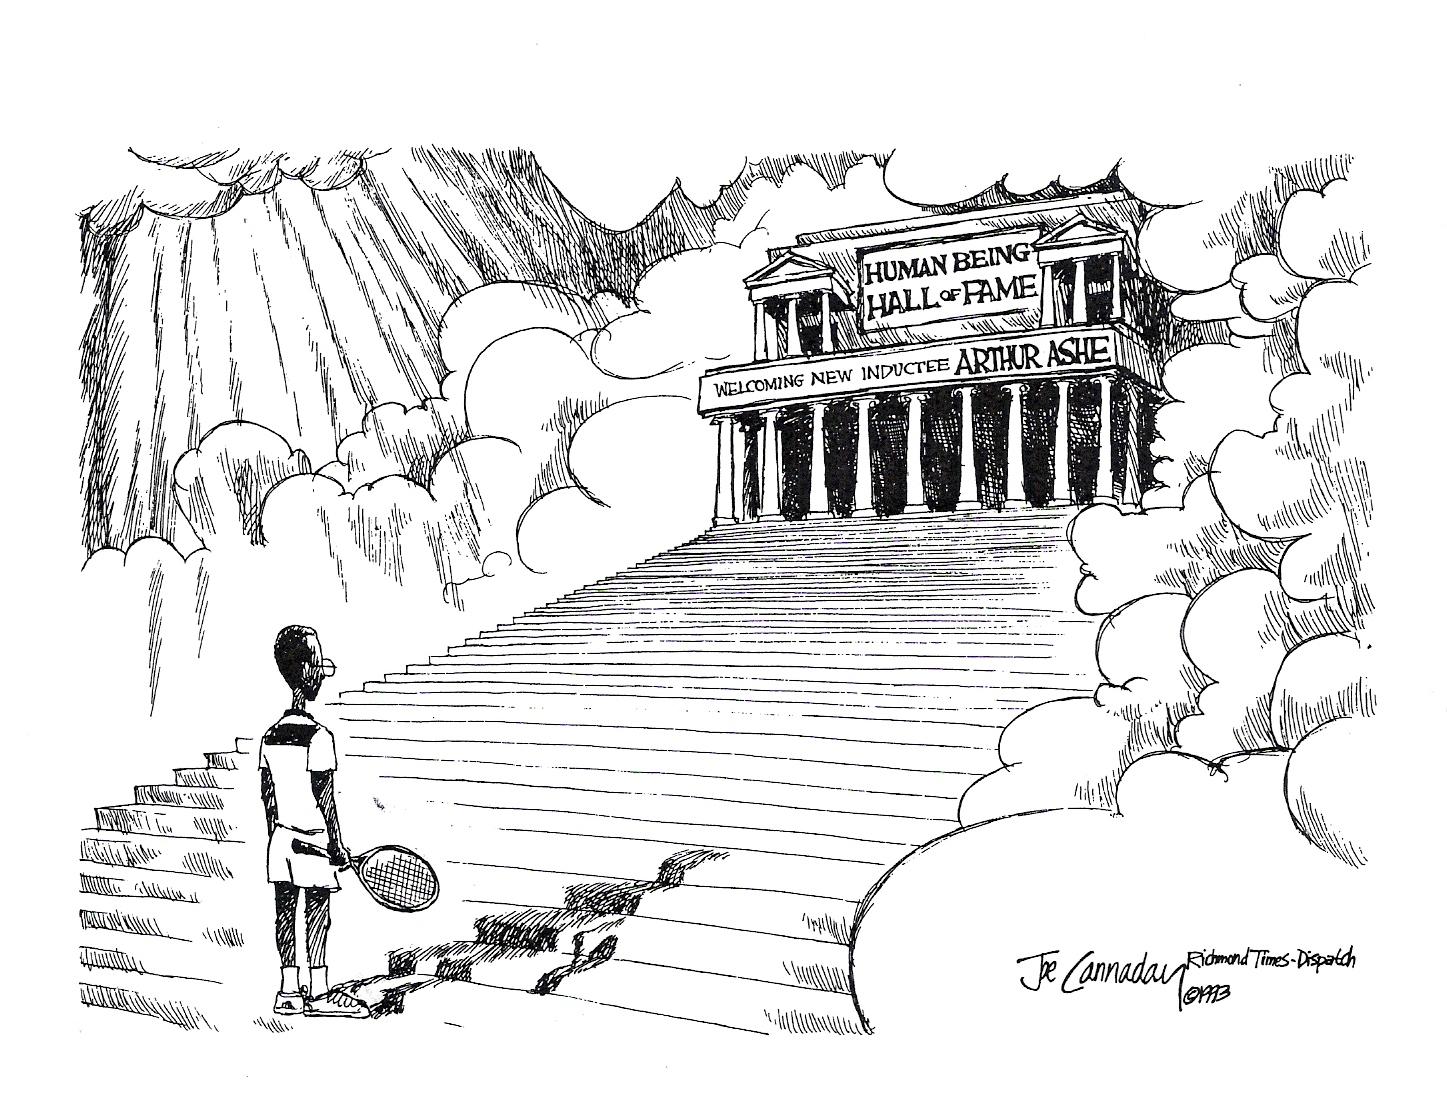 Education from LVA: Arthur Ashe